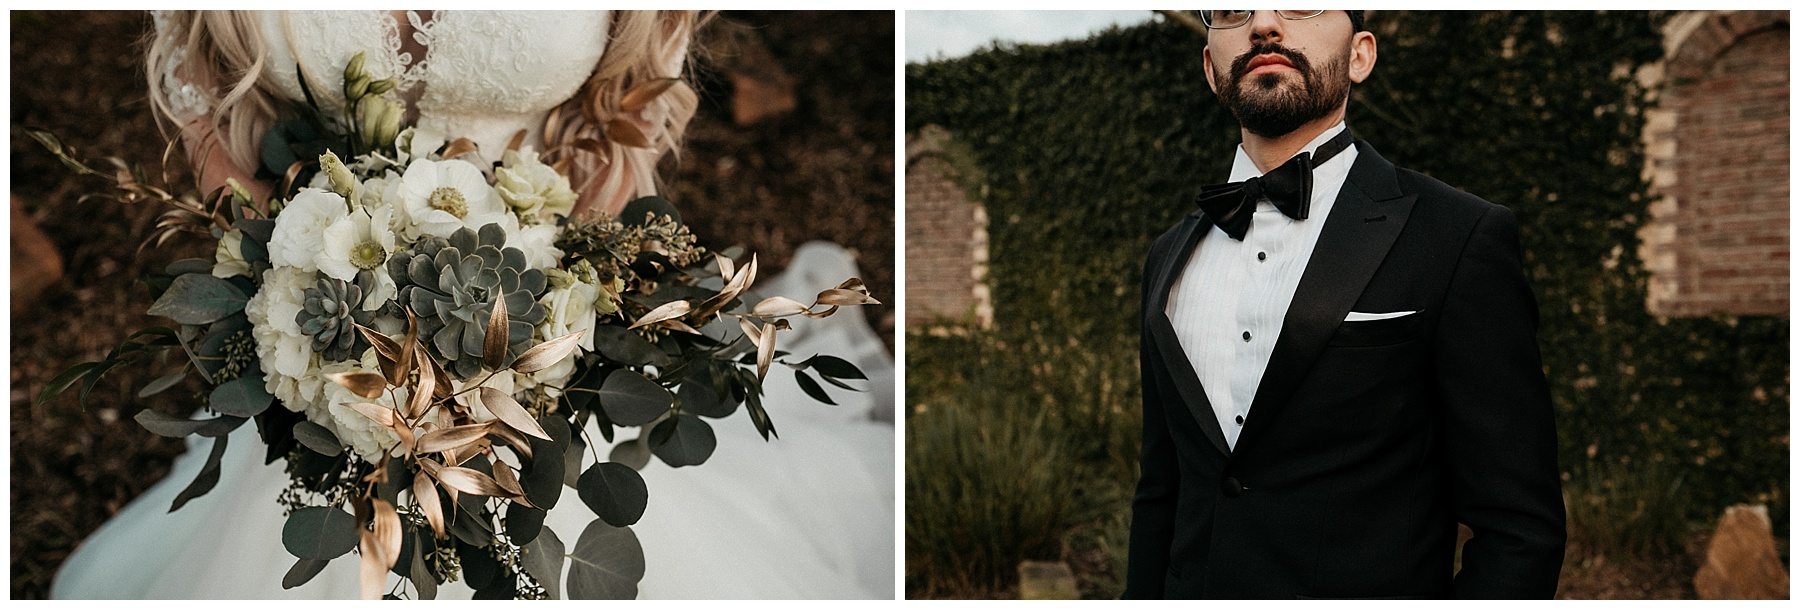 George and Crissa Wedding-112.jpg